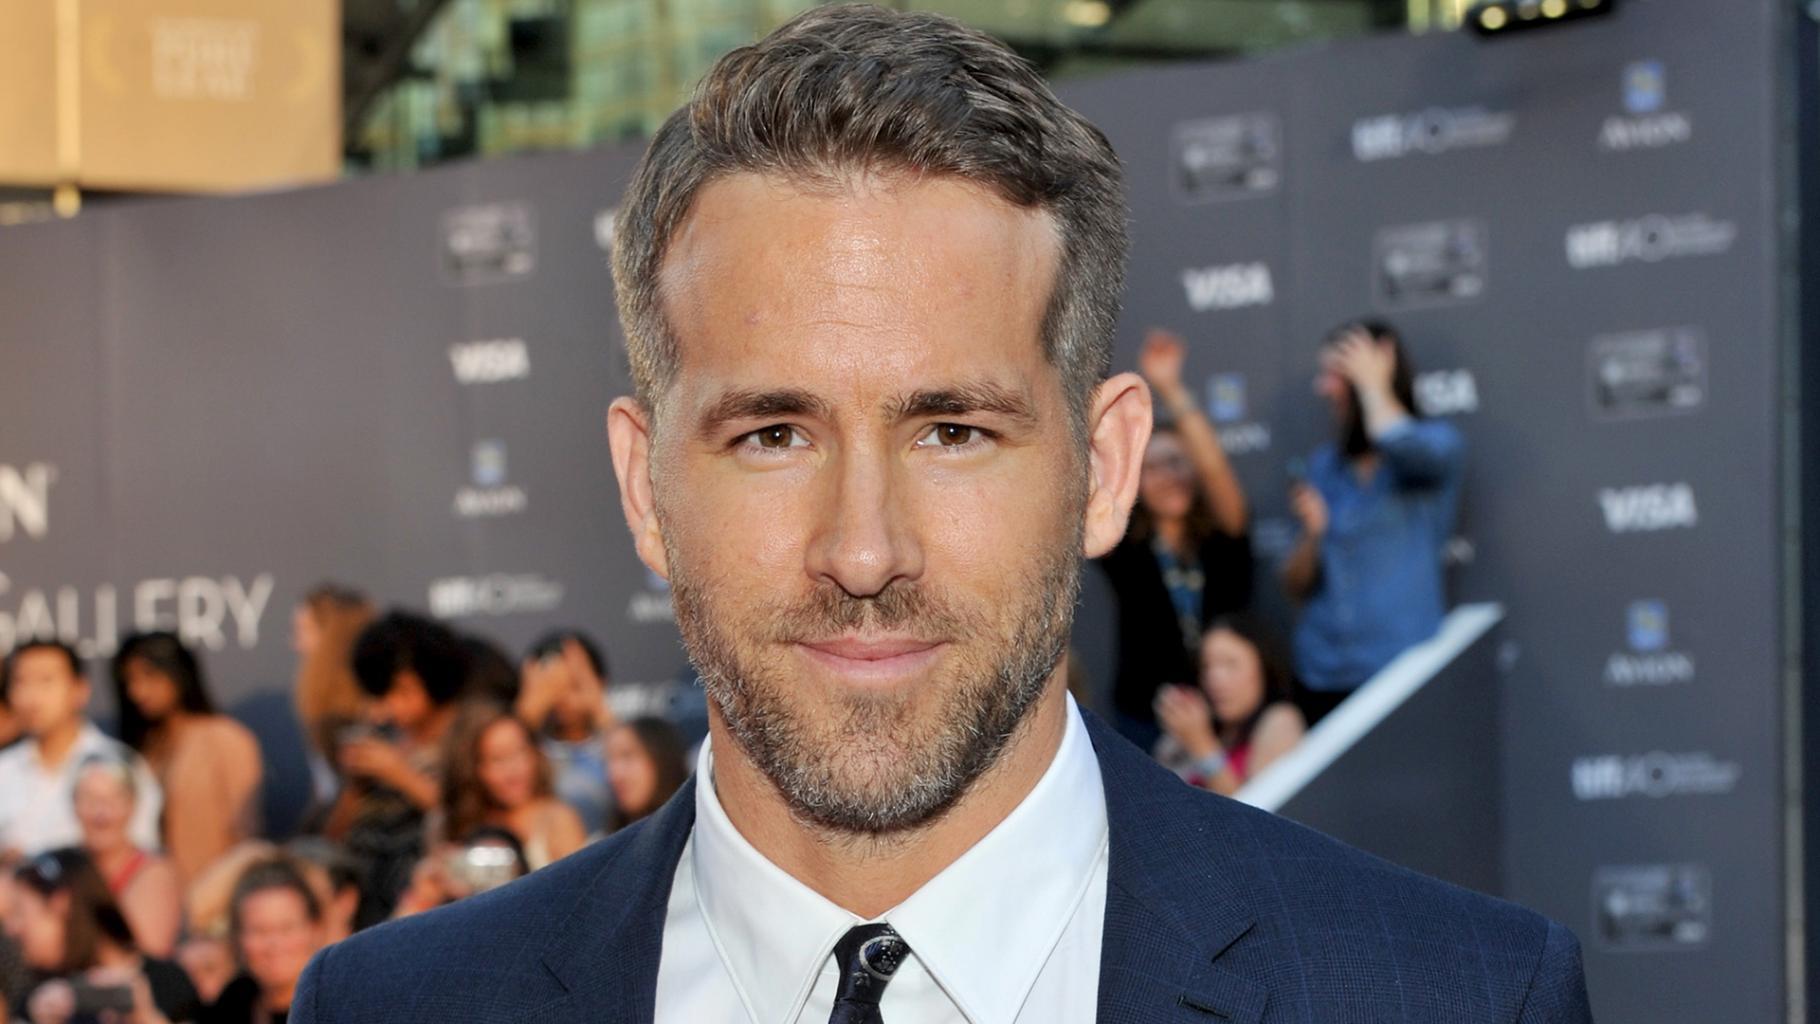 Ryan Reynolds Opens Up On Fatherhood: 'Lack Of Sleep, And The